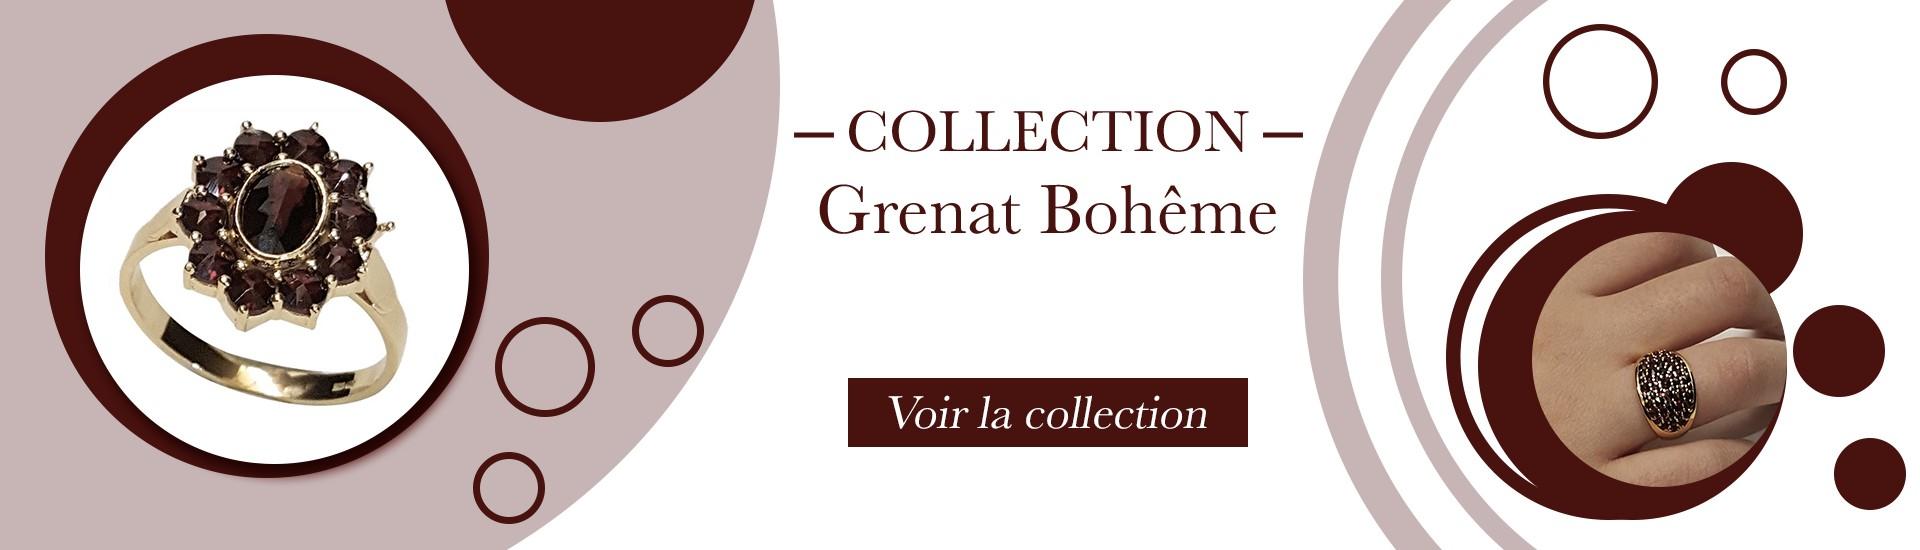 Collection Grenat Bohême